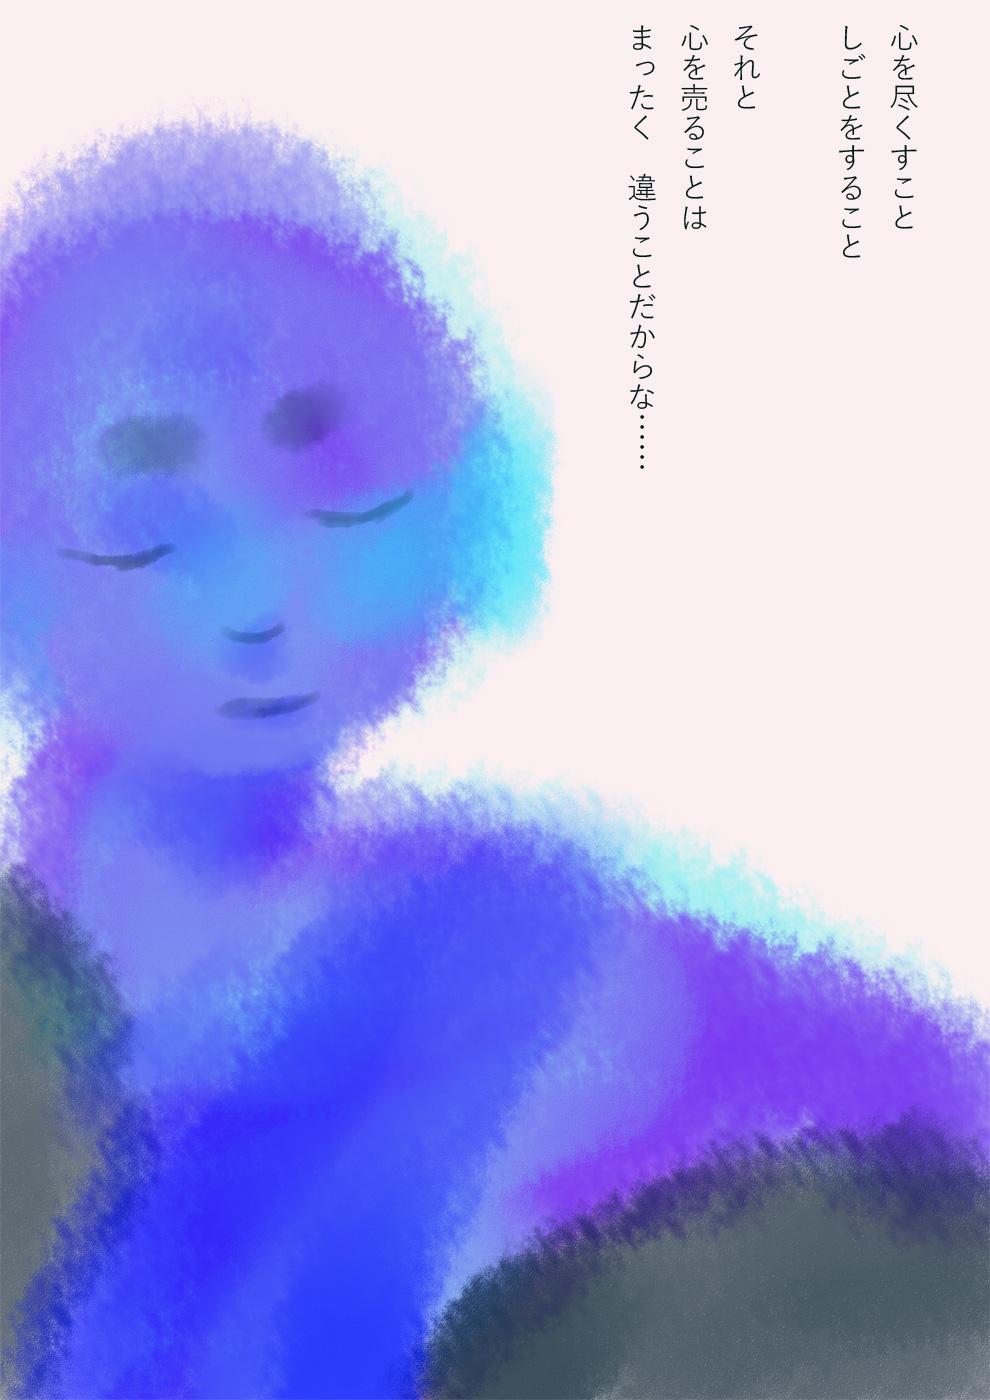 http://ahito.com/comic/ehon/kamiuta/img/2018/20180322/02.jpg